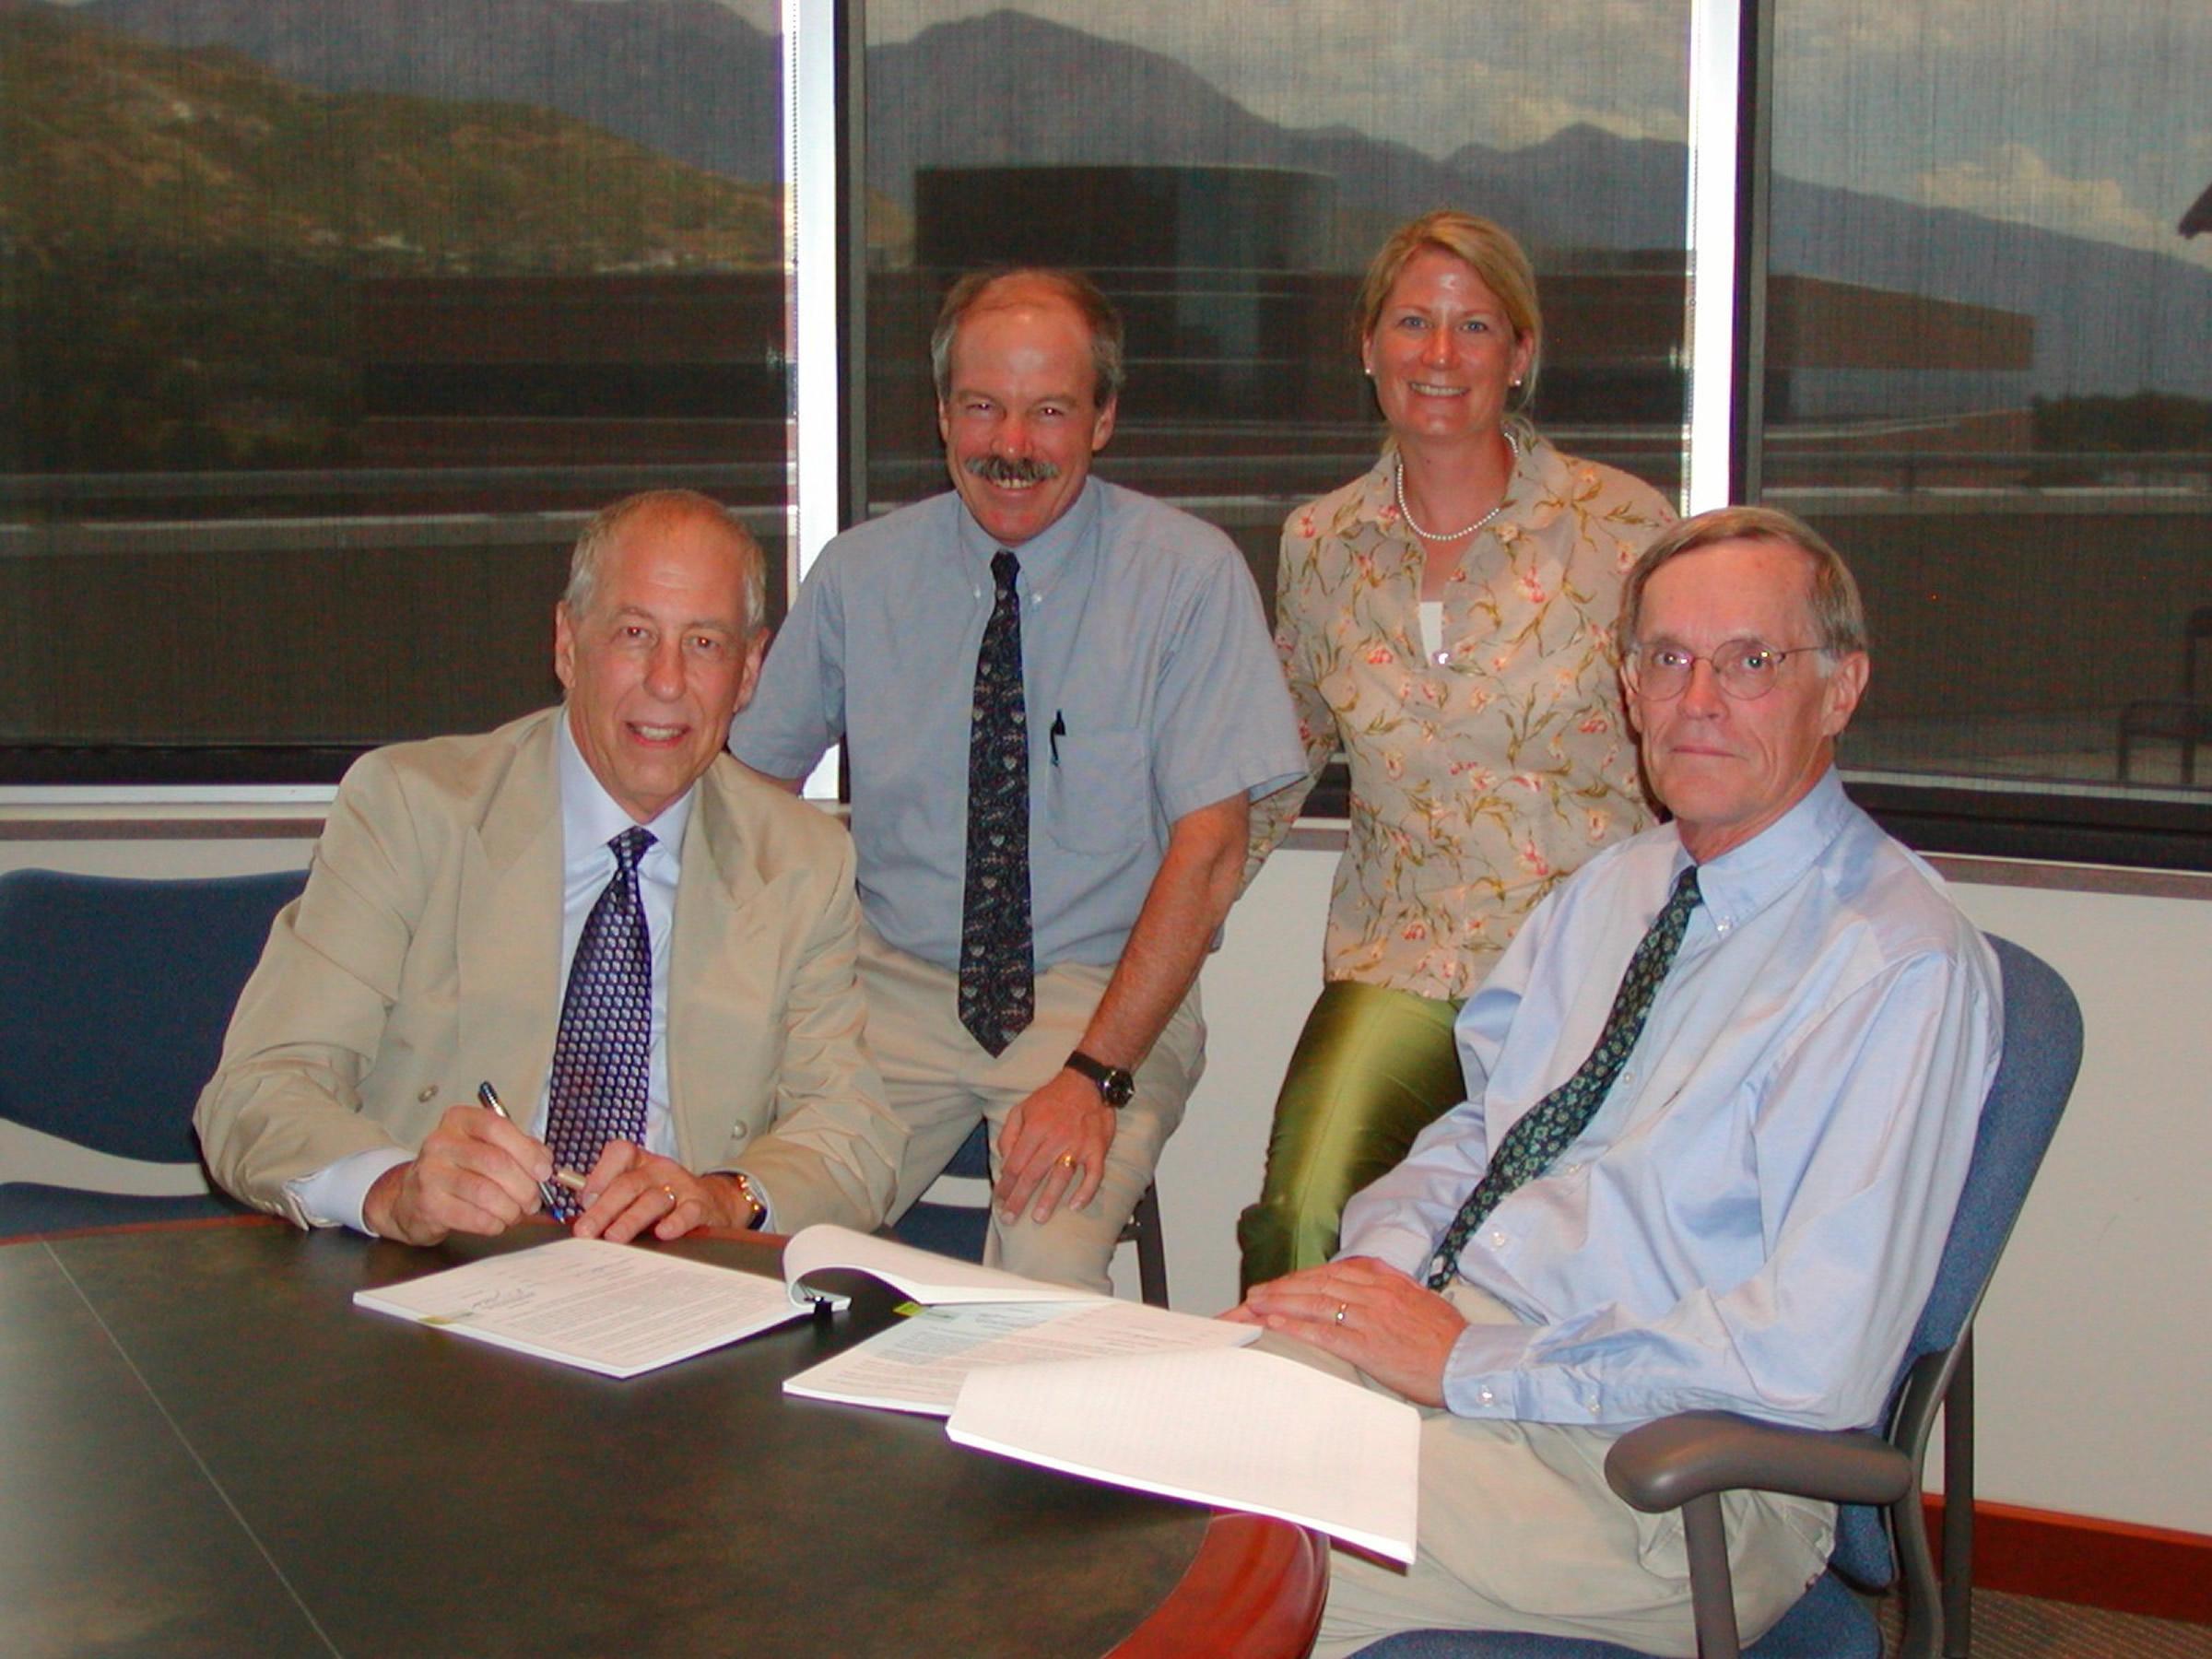 Left to right: Dr. Richard K. Koehn, President & CEO, Sentrx; Dr. Glenn D. Prestwich, Chairman of Medicinal Chemistry, U of U; Sheryl G. Hohle, Sr. Licensing Manager, U of U; and Dr. Raymond F. Gesteland, Vice President of Research, U of U.